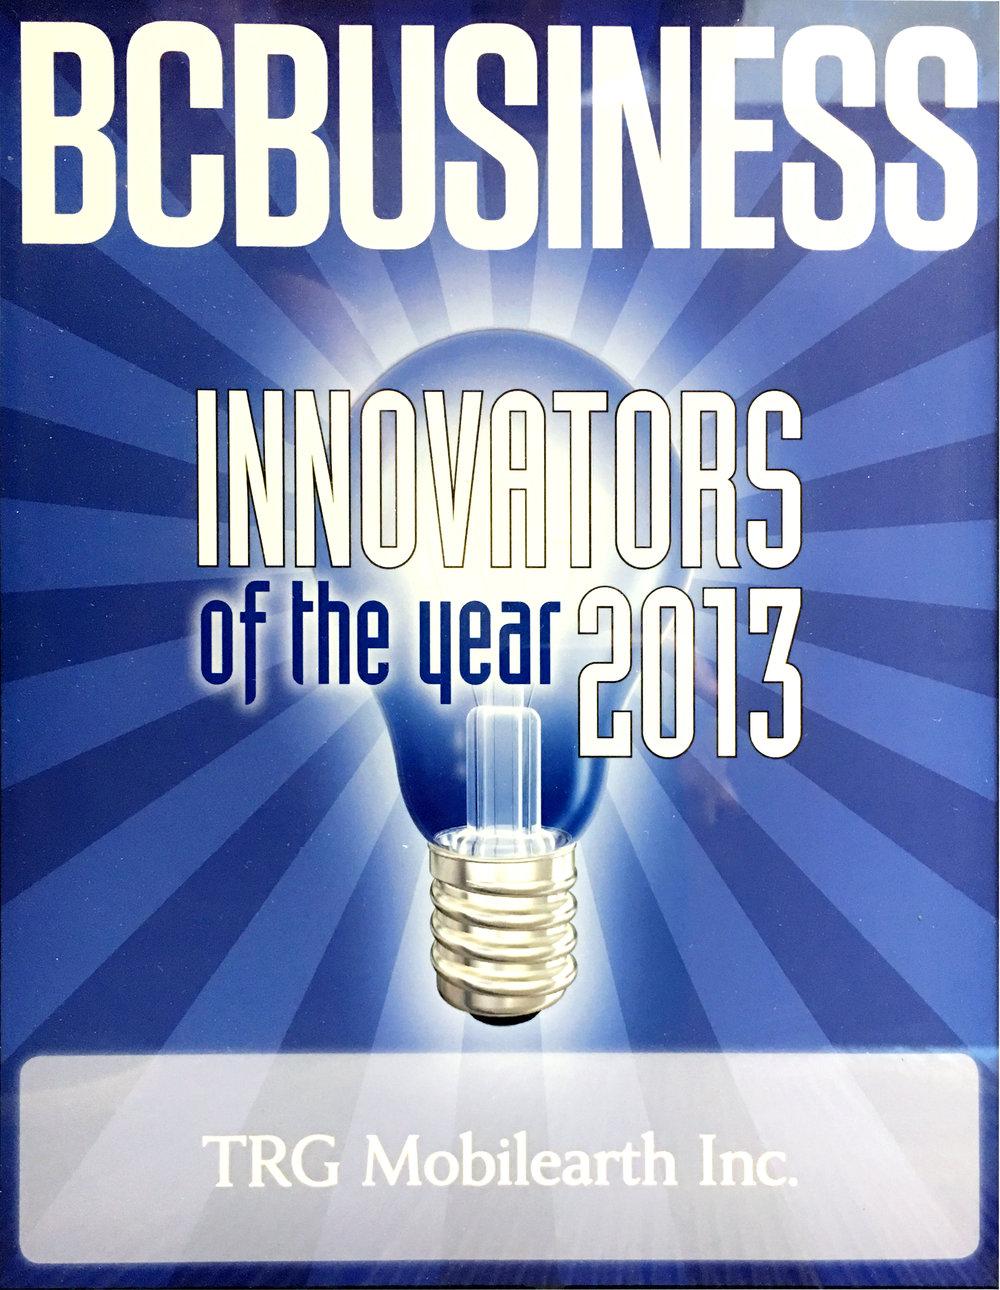 Mobilearth-BCBusiness-Award.jpg